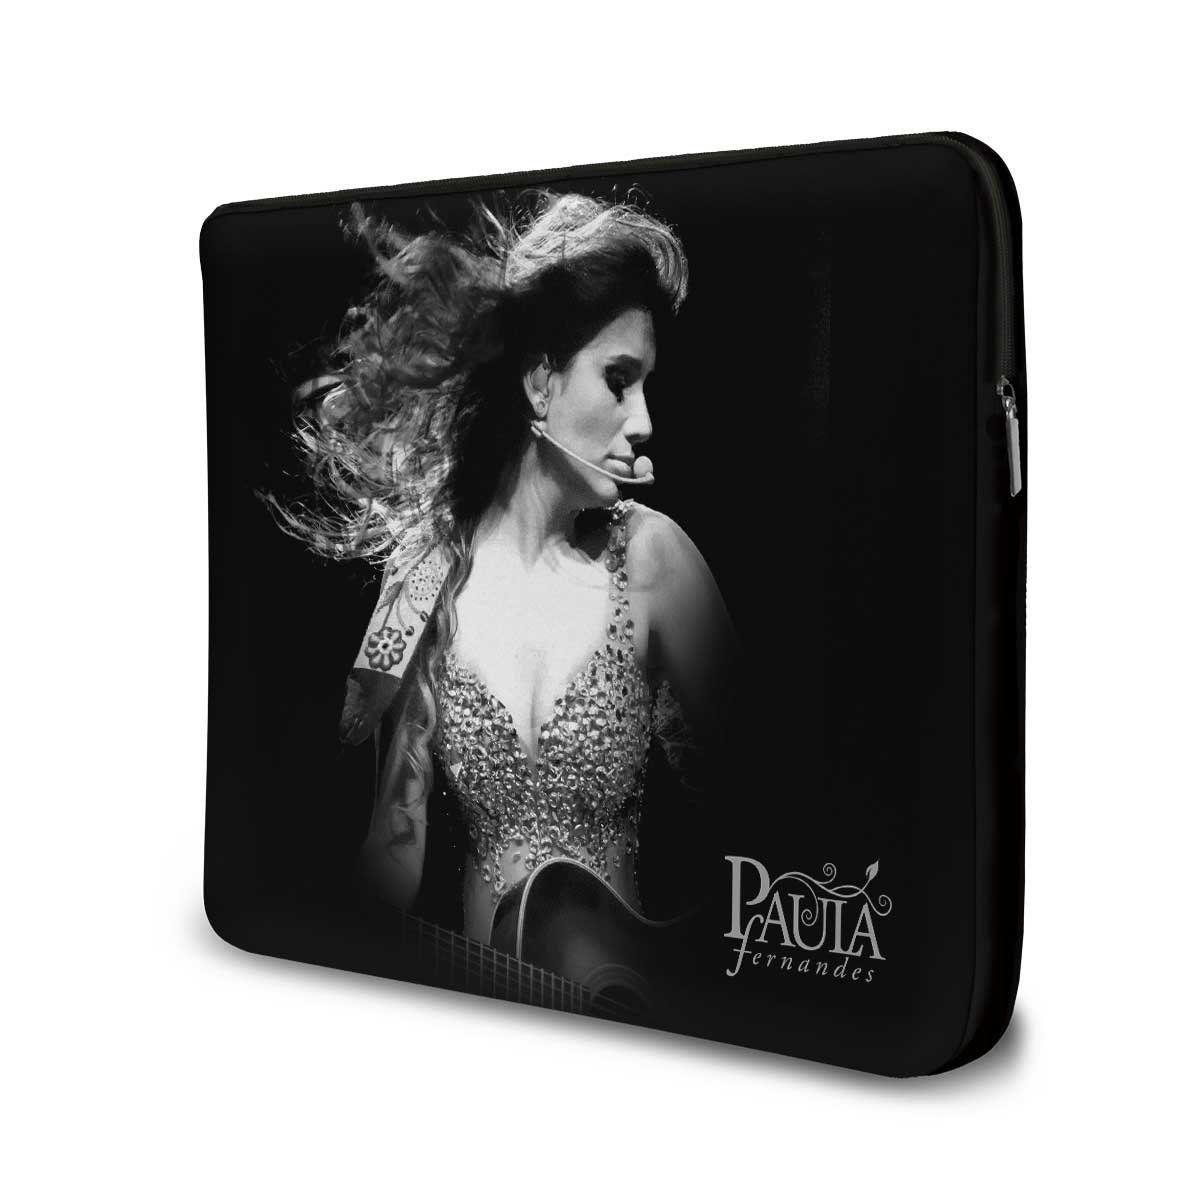 Capa para Notebook Paula Fernandes Foto Oficial  - bandUP Store Marketplace